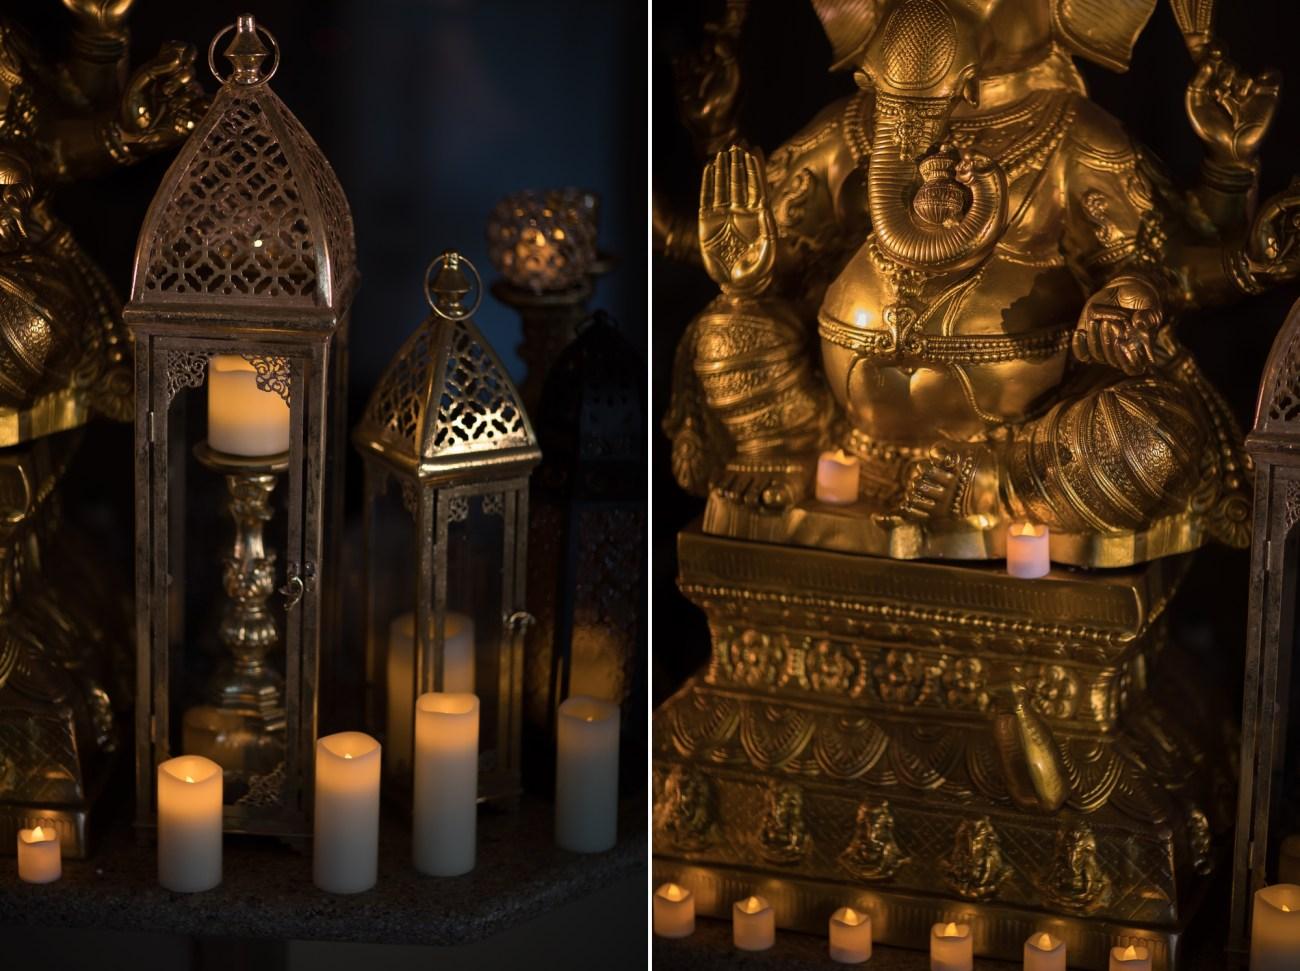 florida-indian-wedding-decorators-2 Indian Wedding Decoration in Florida   Ganesha Statue